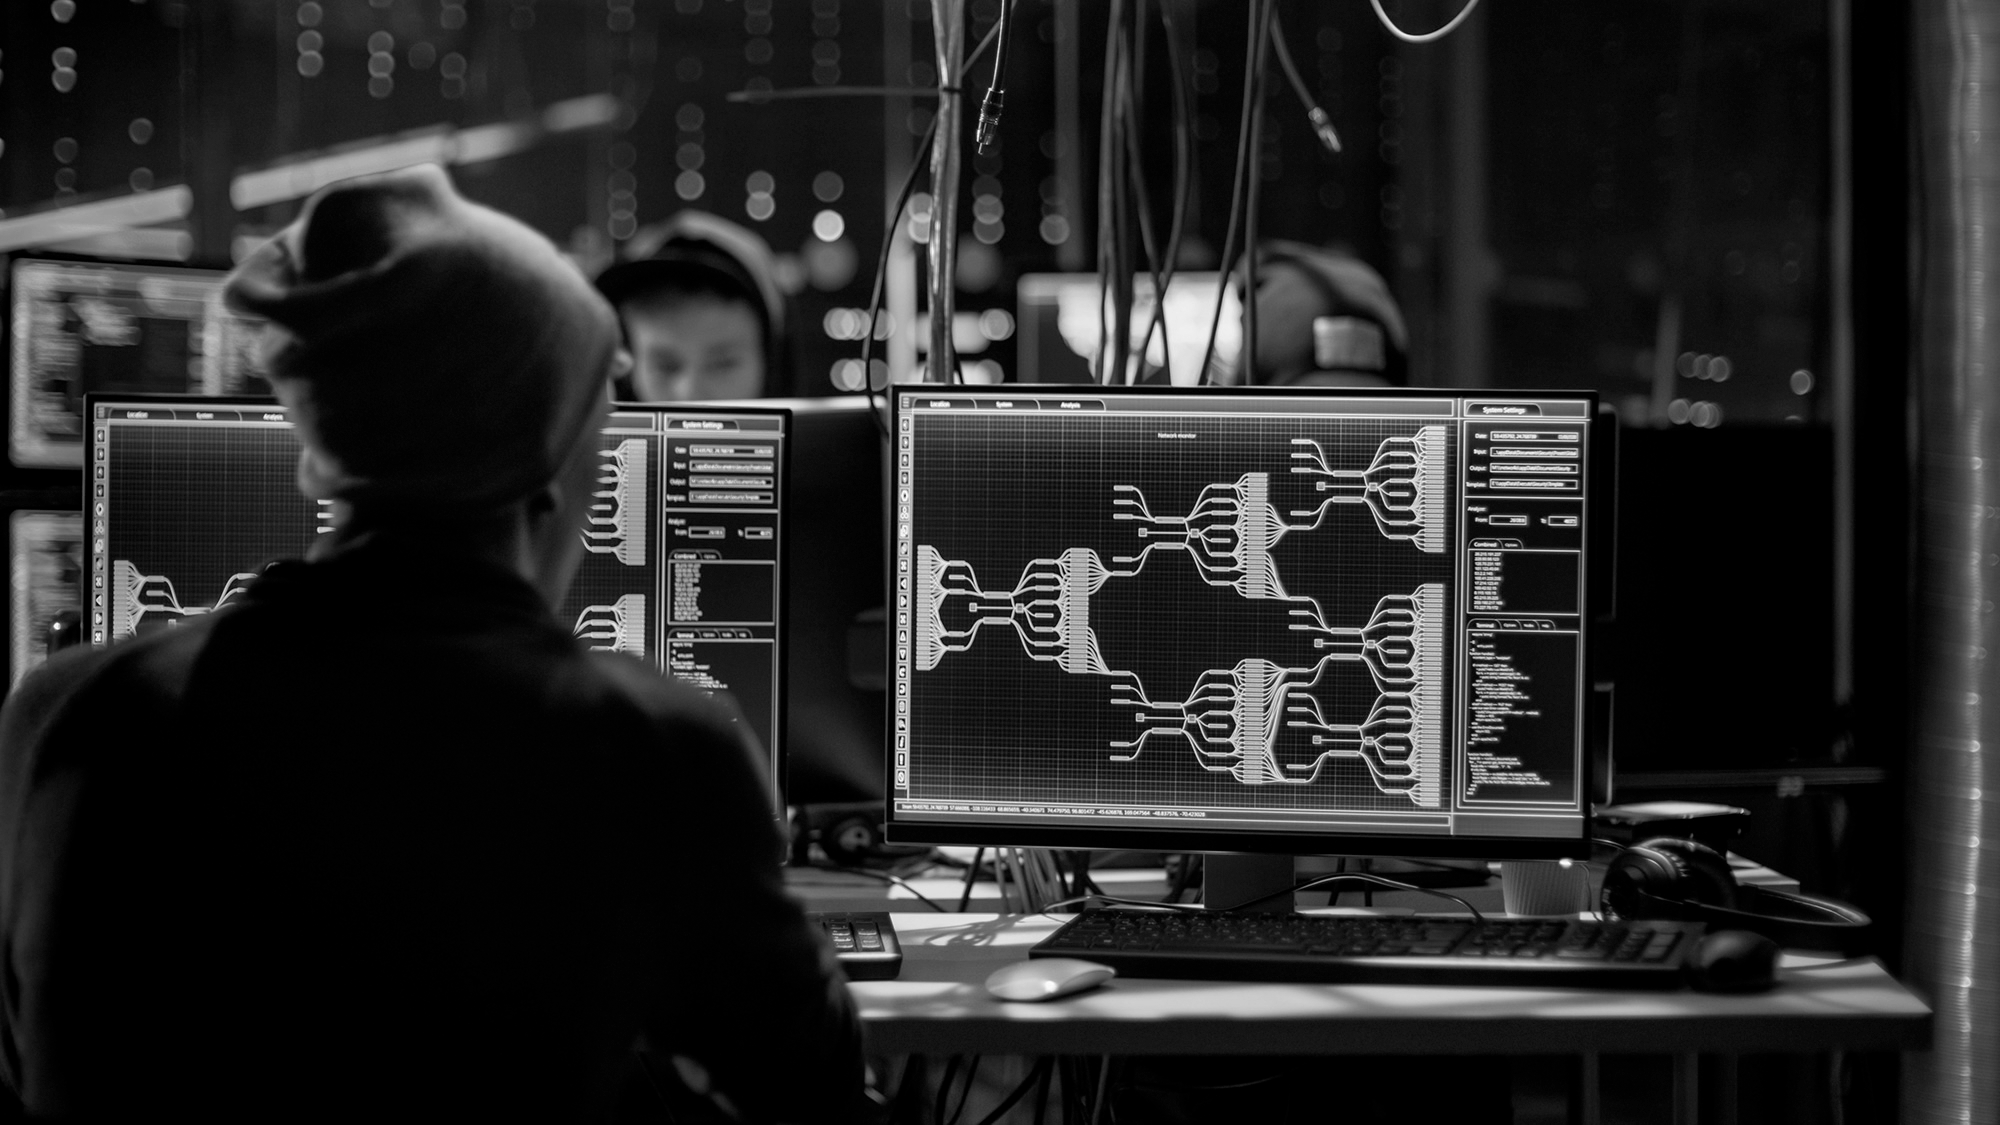 MITRE ATT&CK, navegando al interior del ciclo de vida de un ciberataque